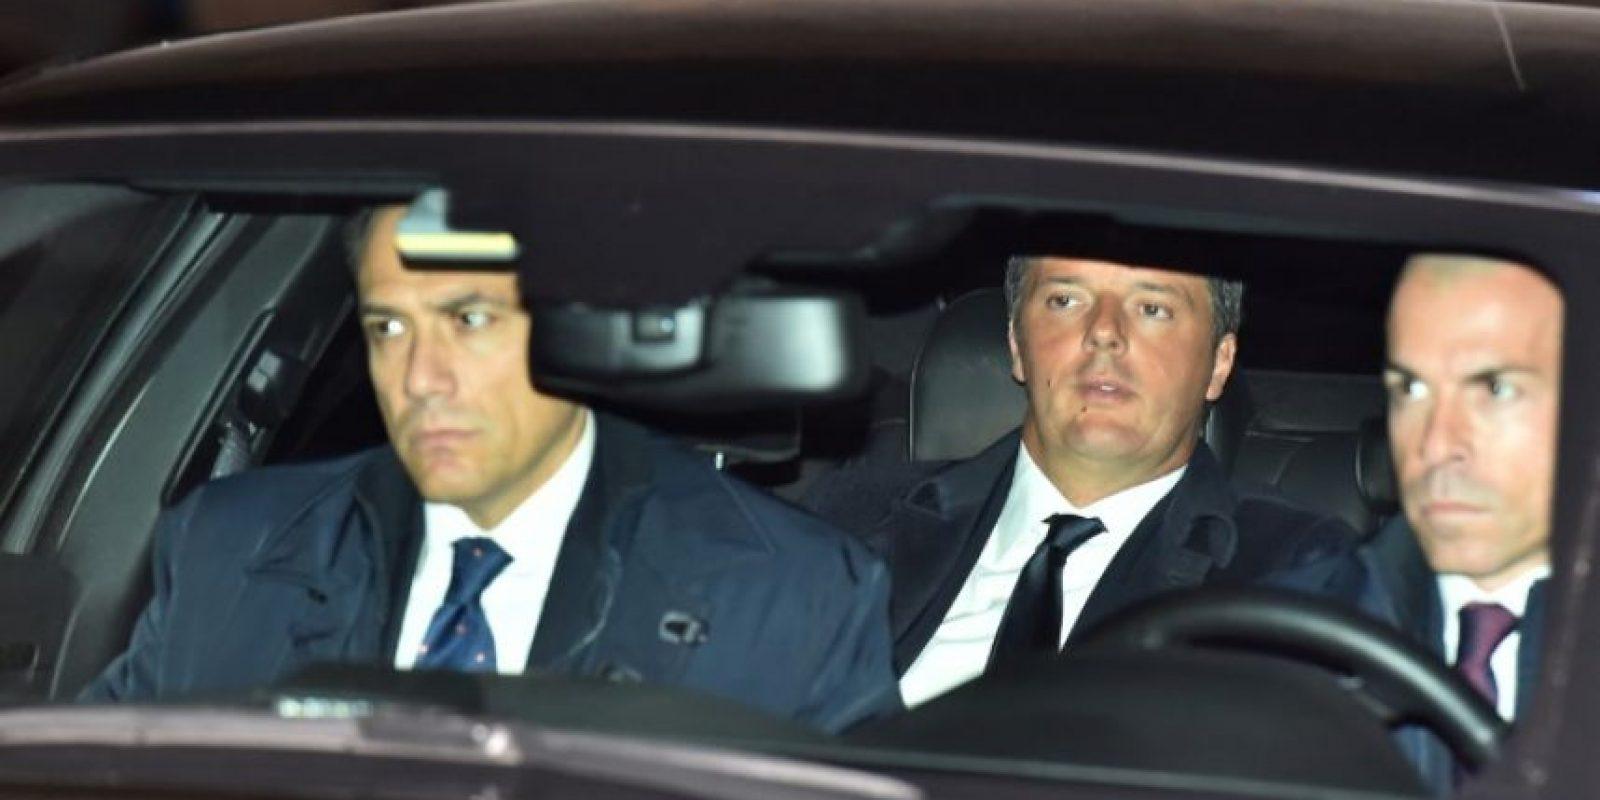 El primer Ministro de Italia Matteo Renzi (C) arriba al Palacio Quirinale el 7 de diciembre de 2016 en Roma Foto:Vincenzo Pinto/afp.com